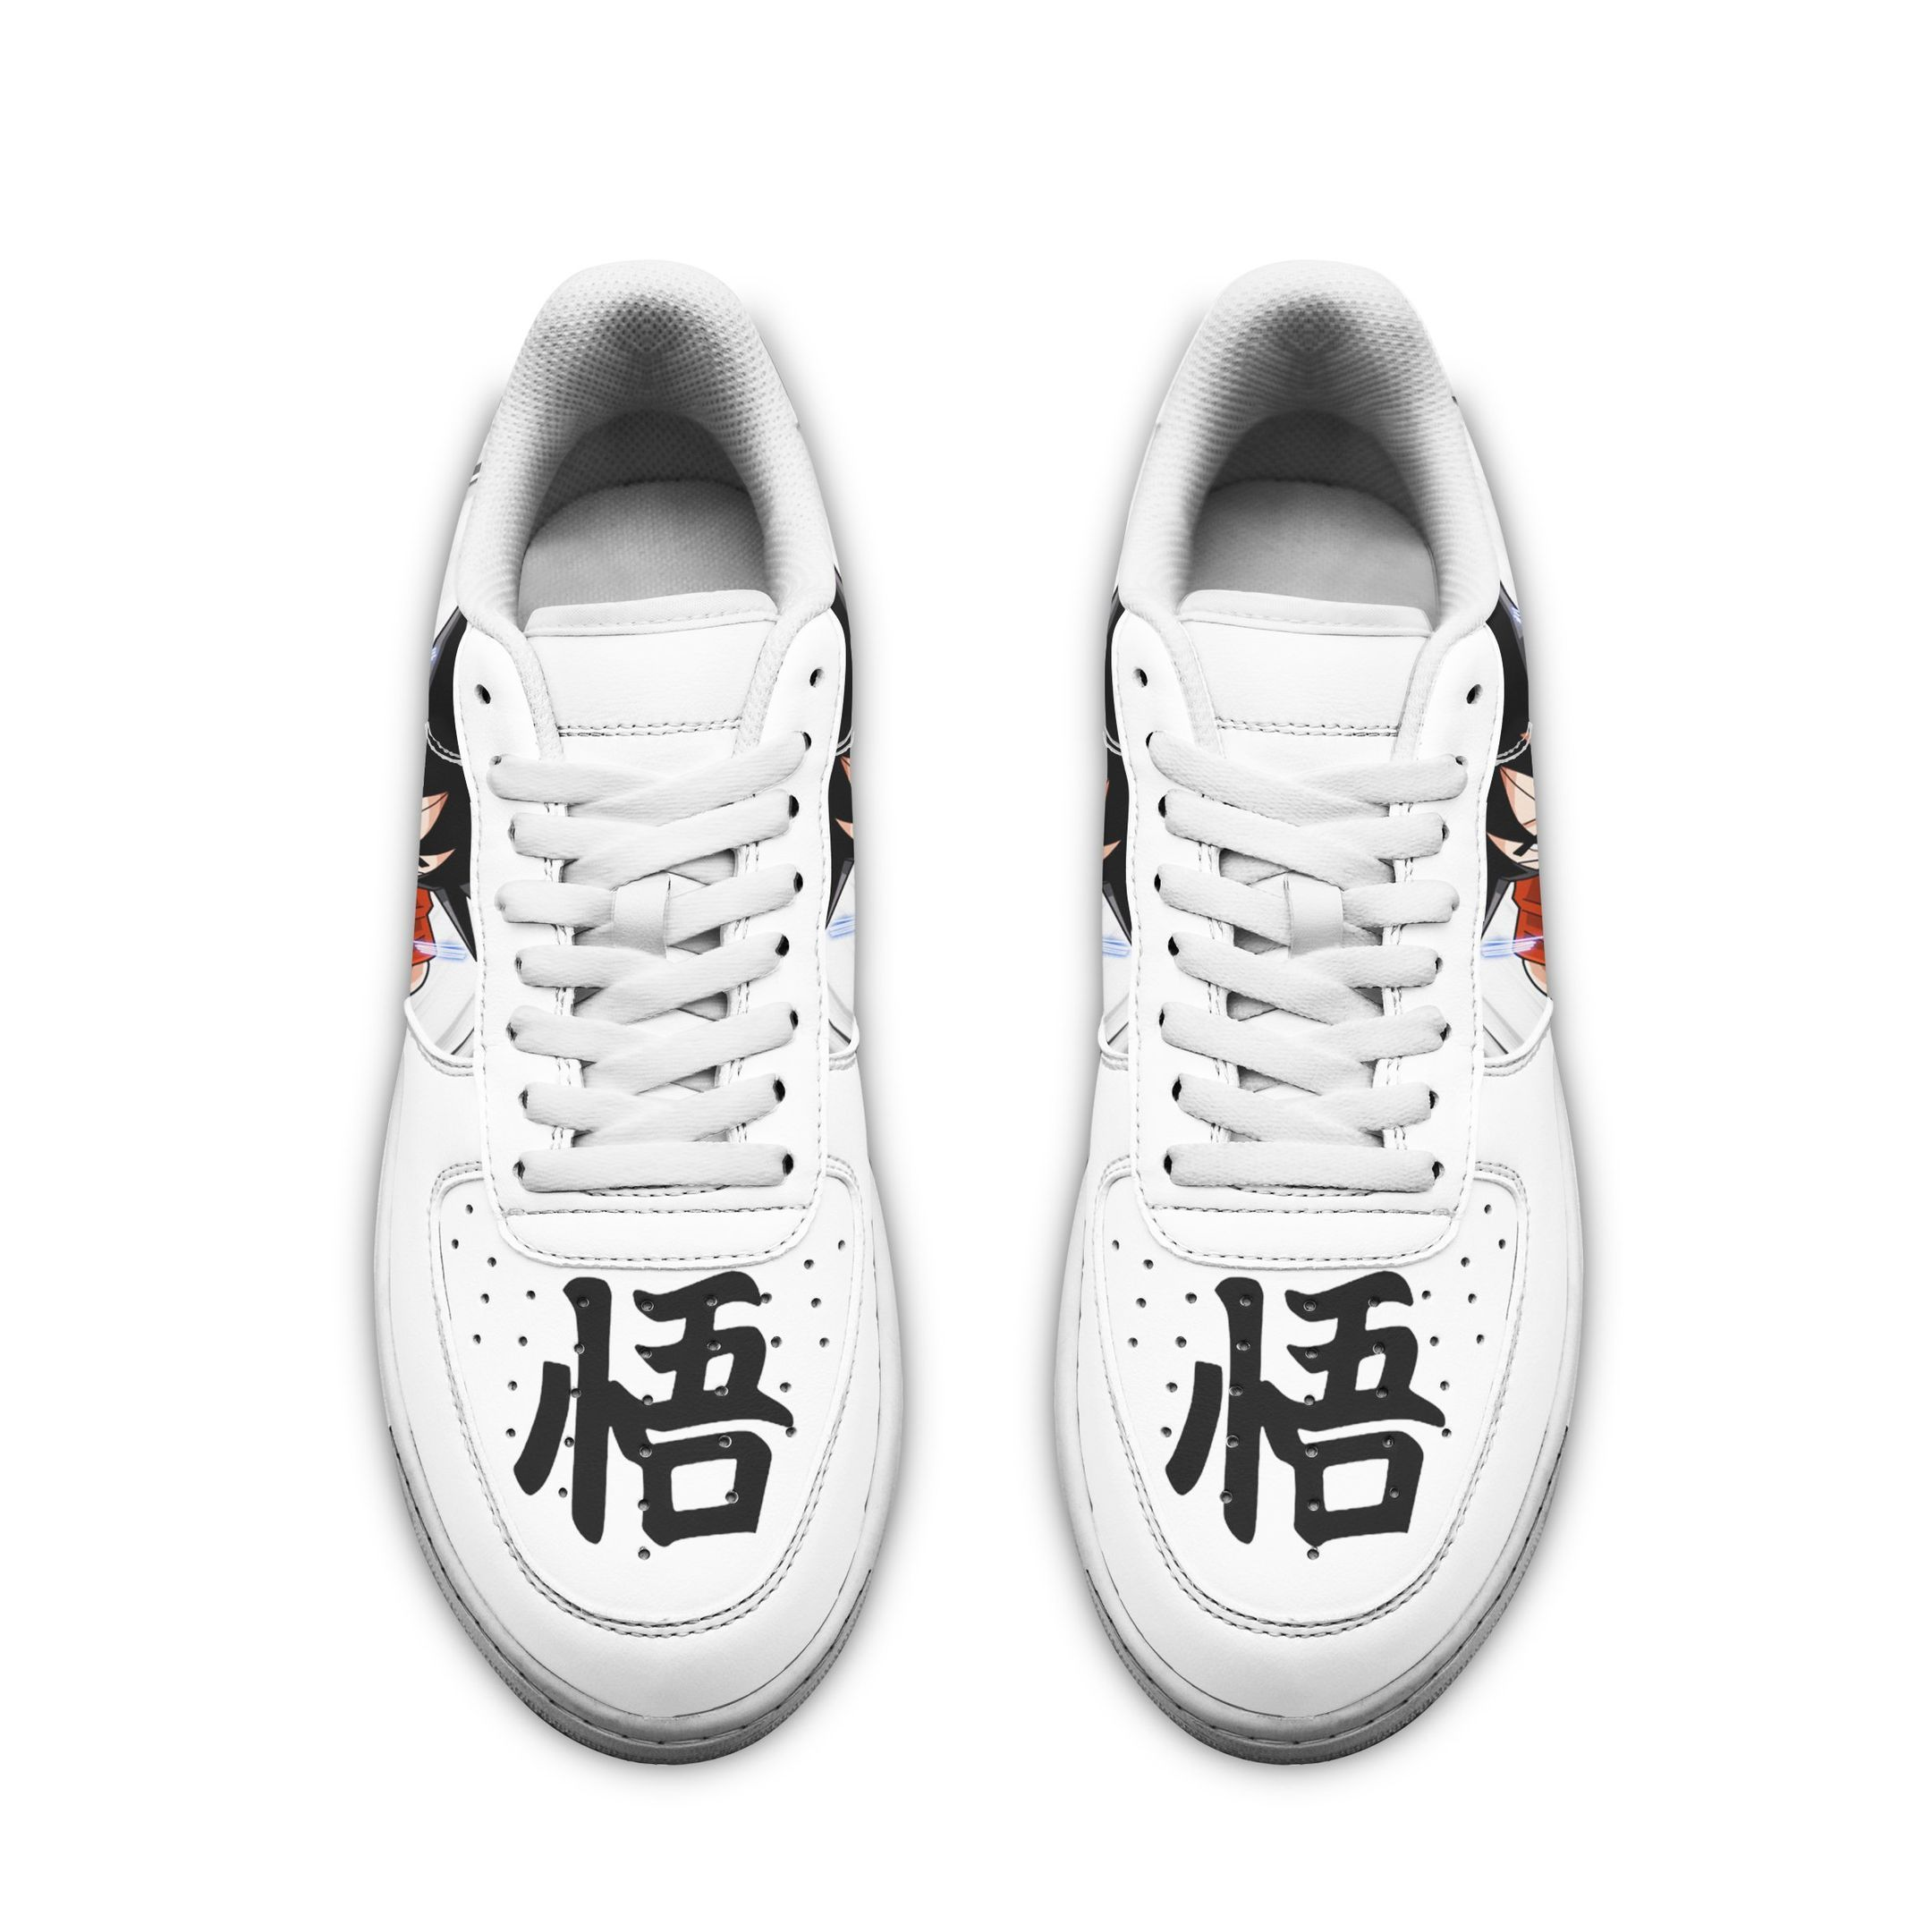 Goku Air Shoes Custom Dragon Ball Z Anime Shoes GO1012